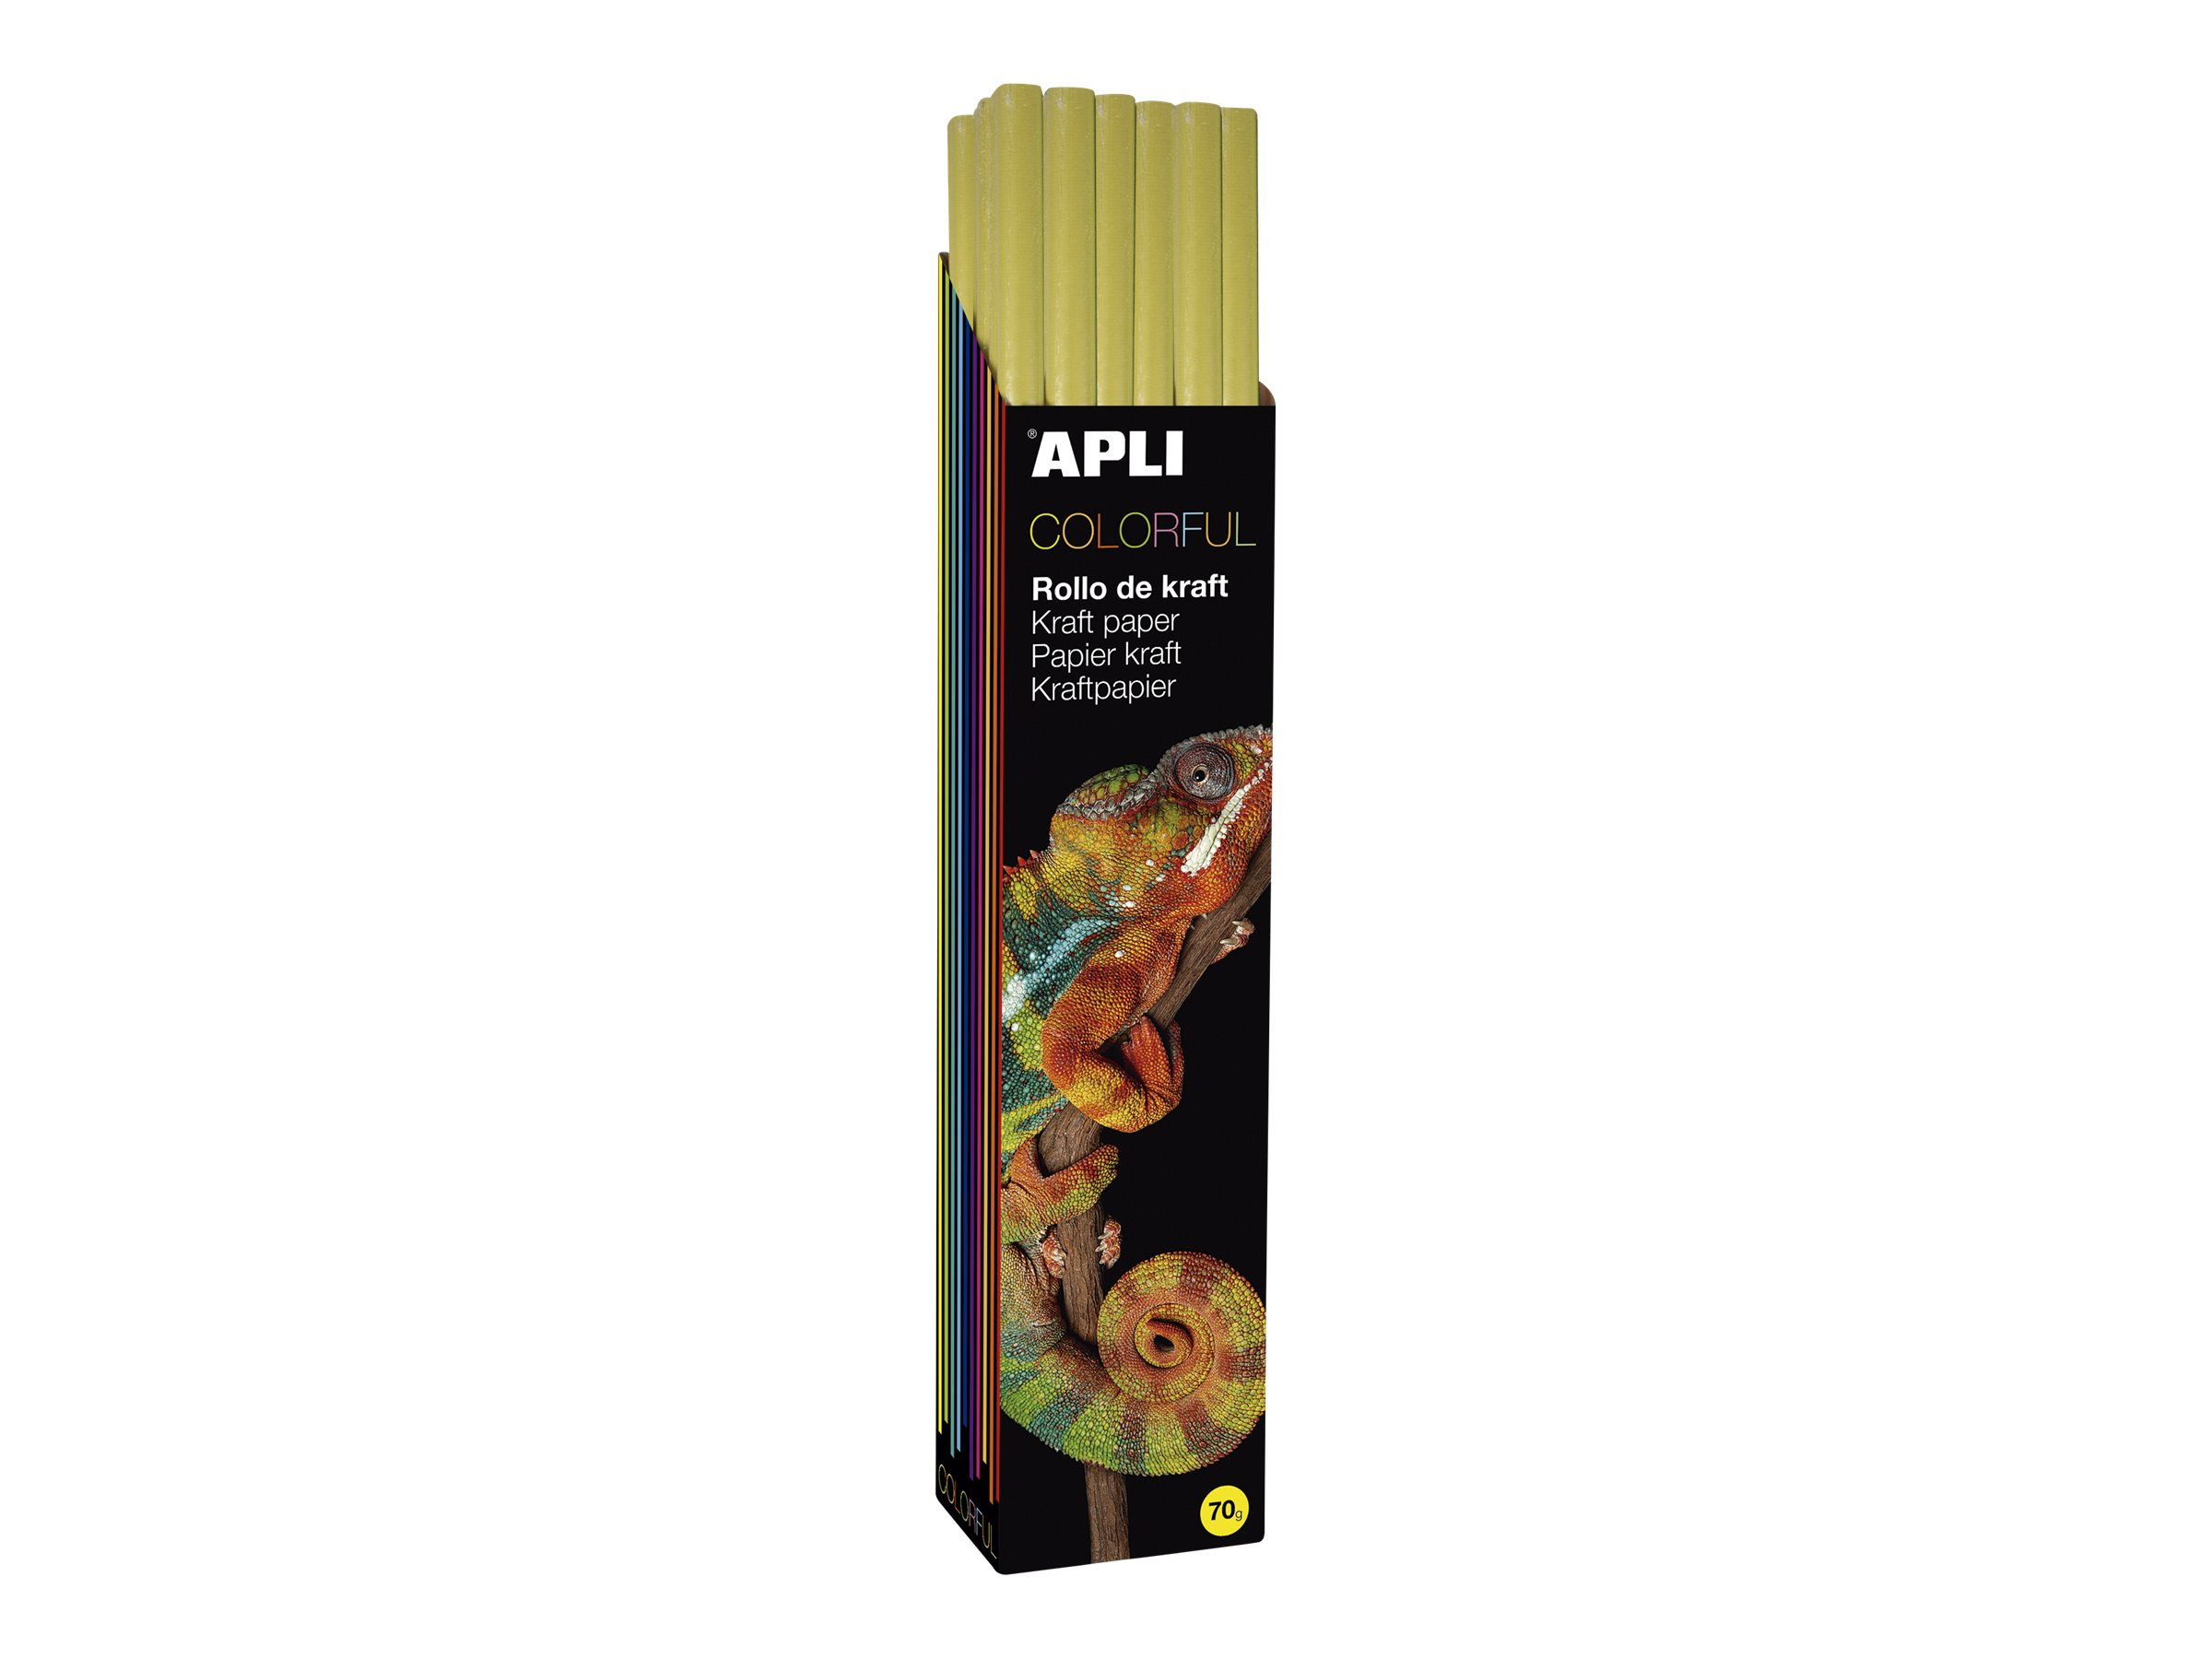 Apli Agipa - Papier cadeau kraft - 100 cm x 3 m - 70 g/m² - jaune